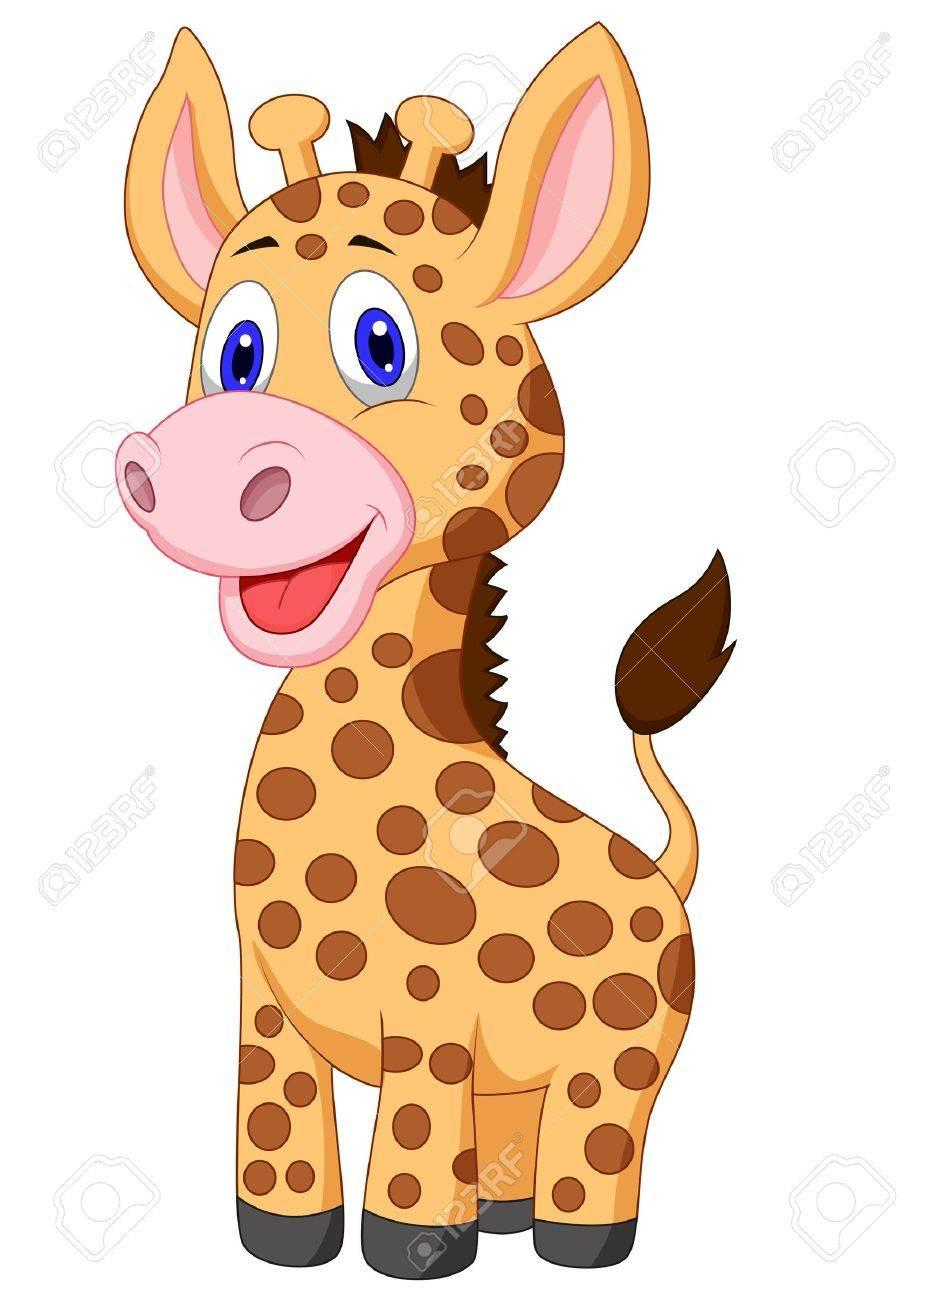 Cute baby giraffe cartoon Stock Vector - 20219435